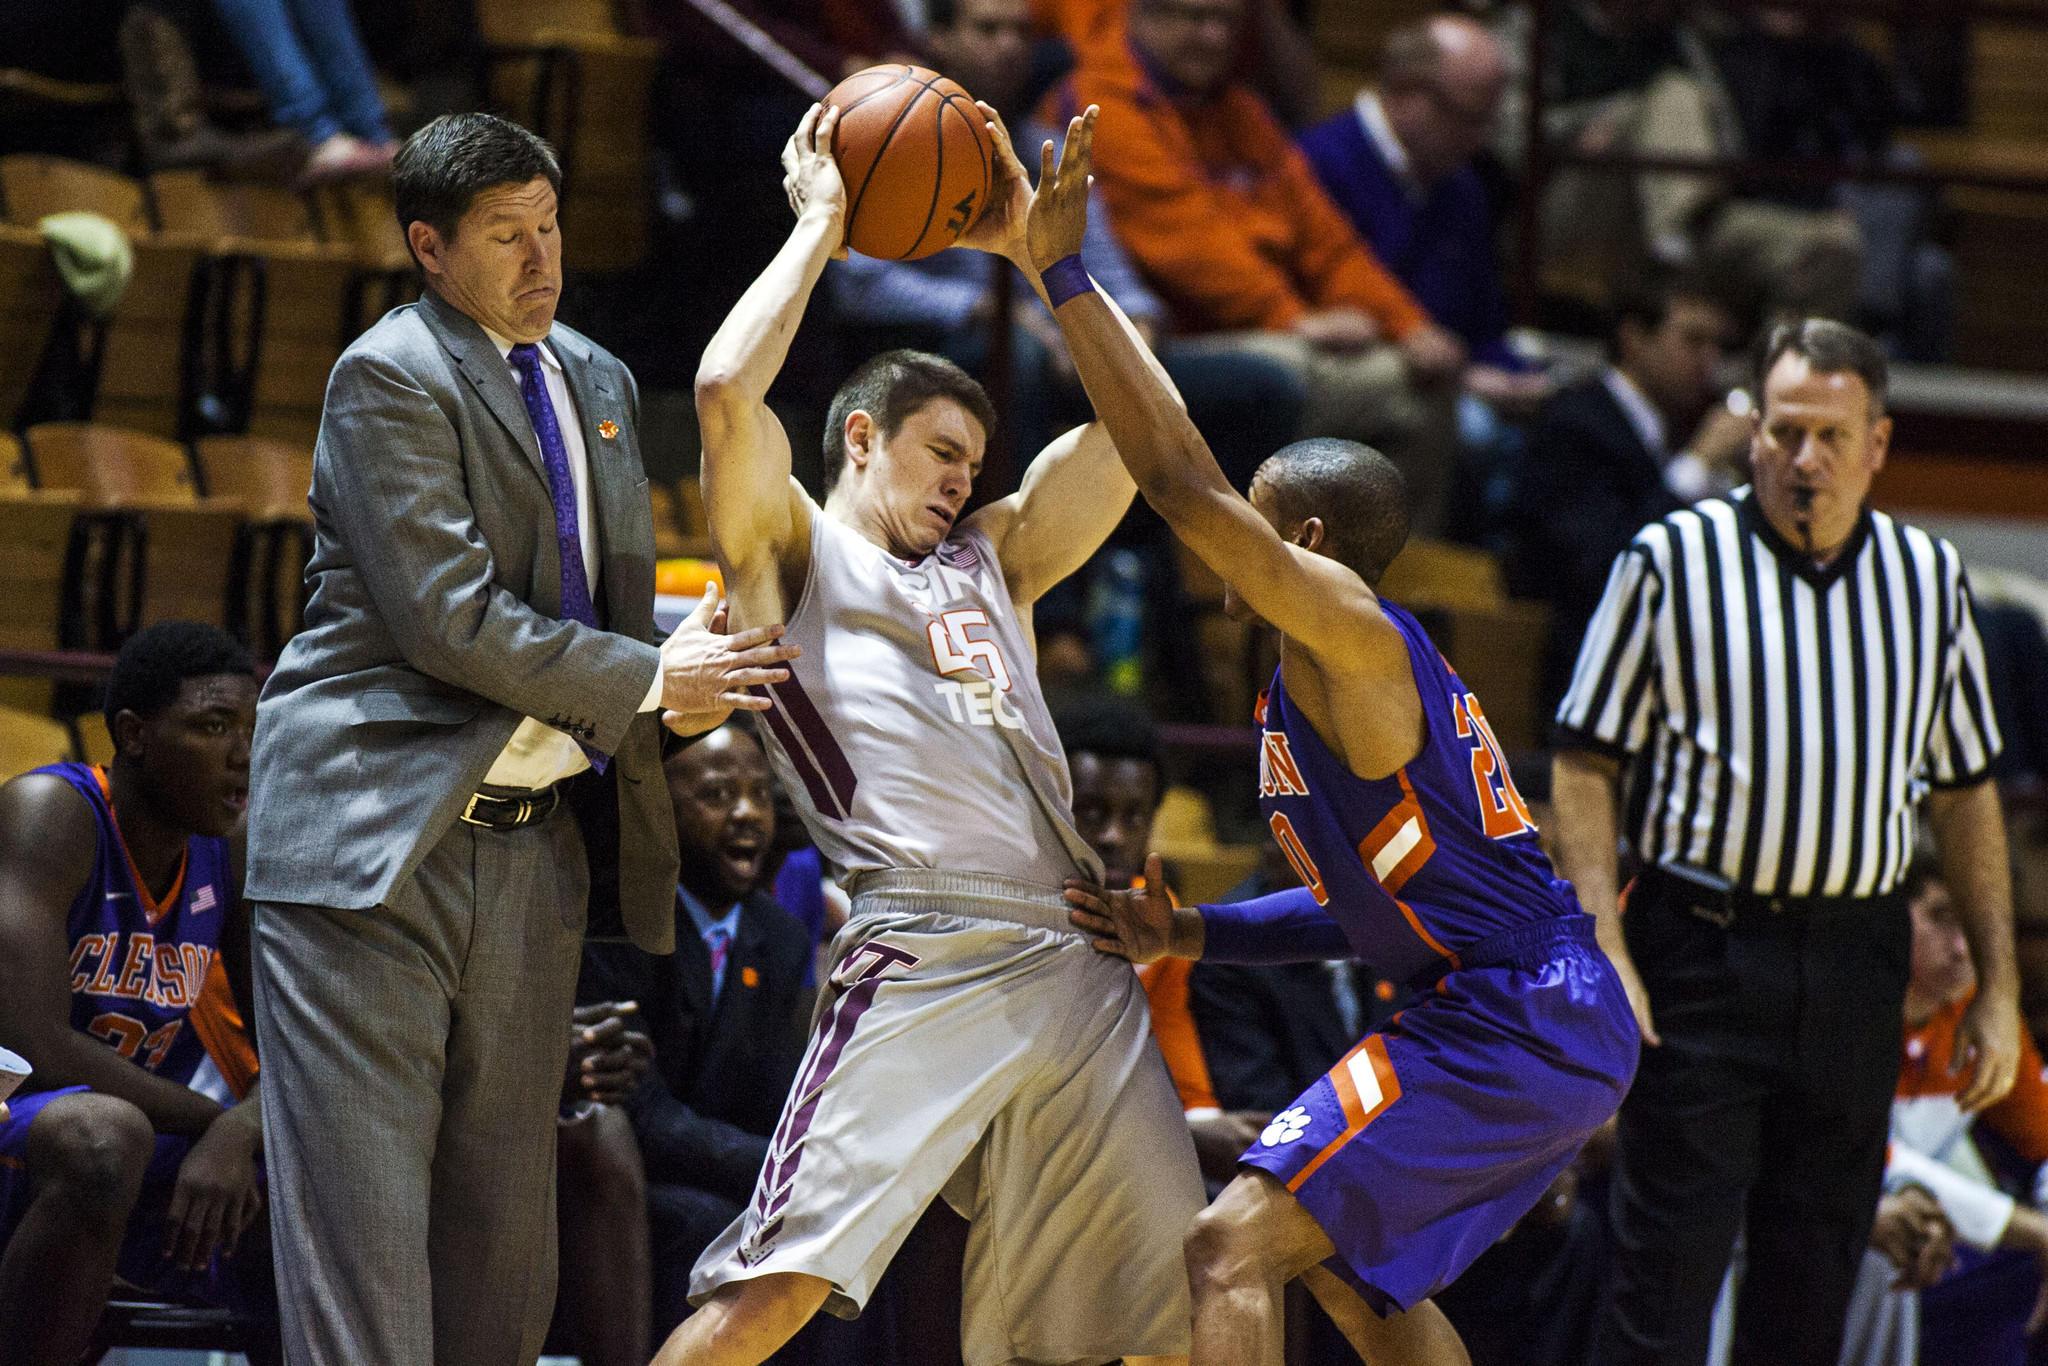 Clemson guard Jordan Roper fouls Virginia Tech guard Will Johnston as Clemson coach Brad Brownell reacts Wednesday in Blacksburg.